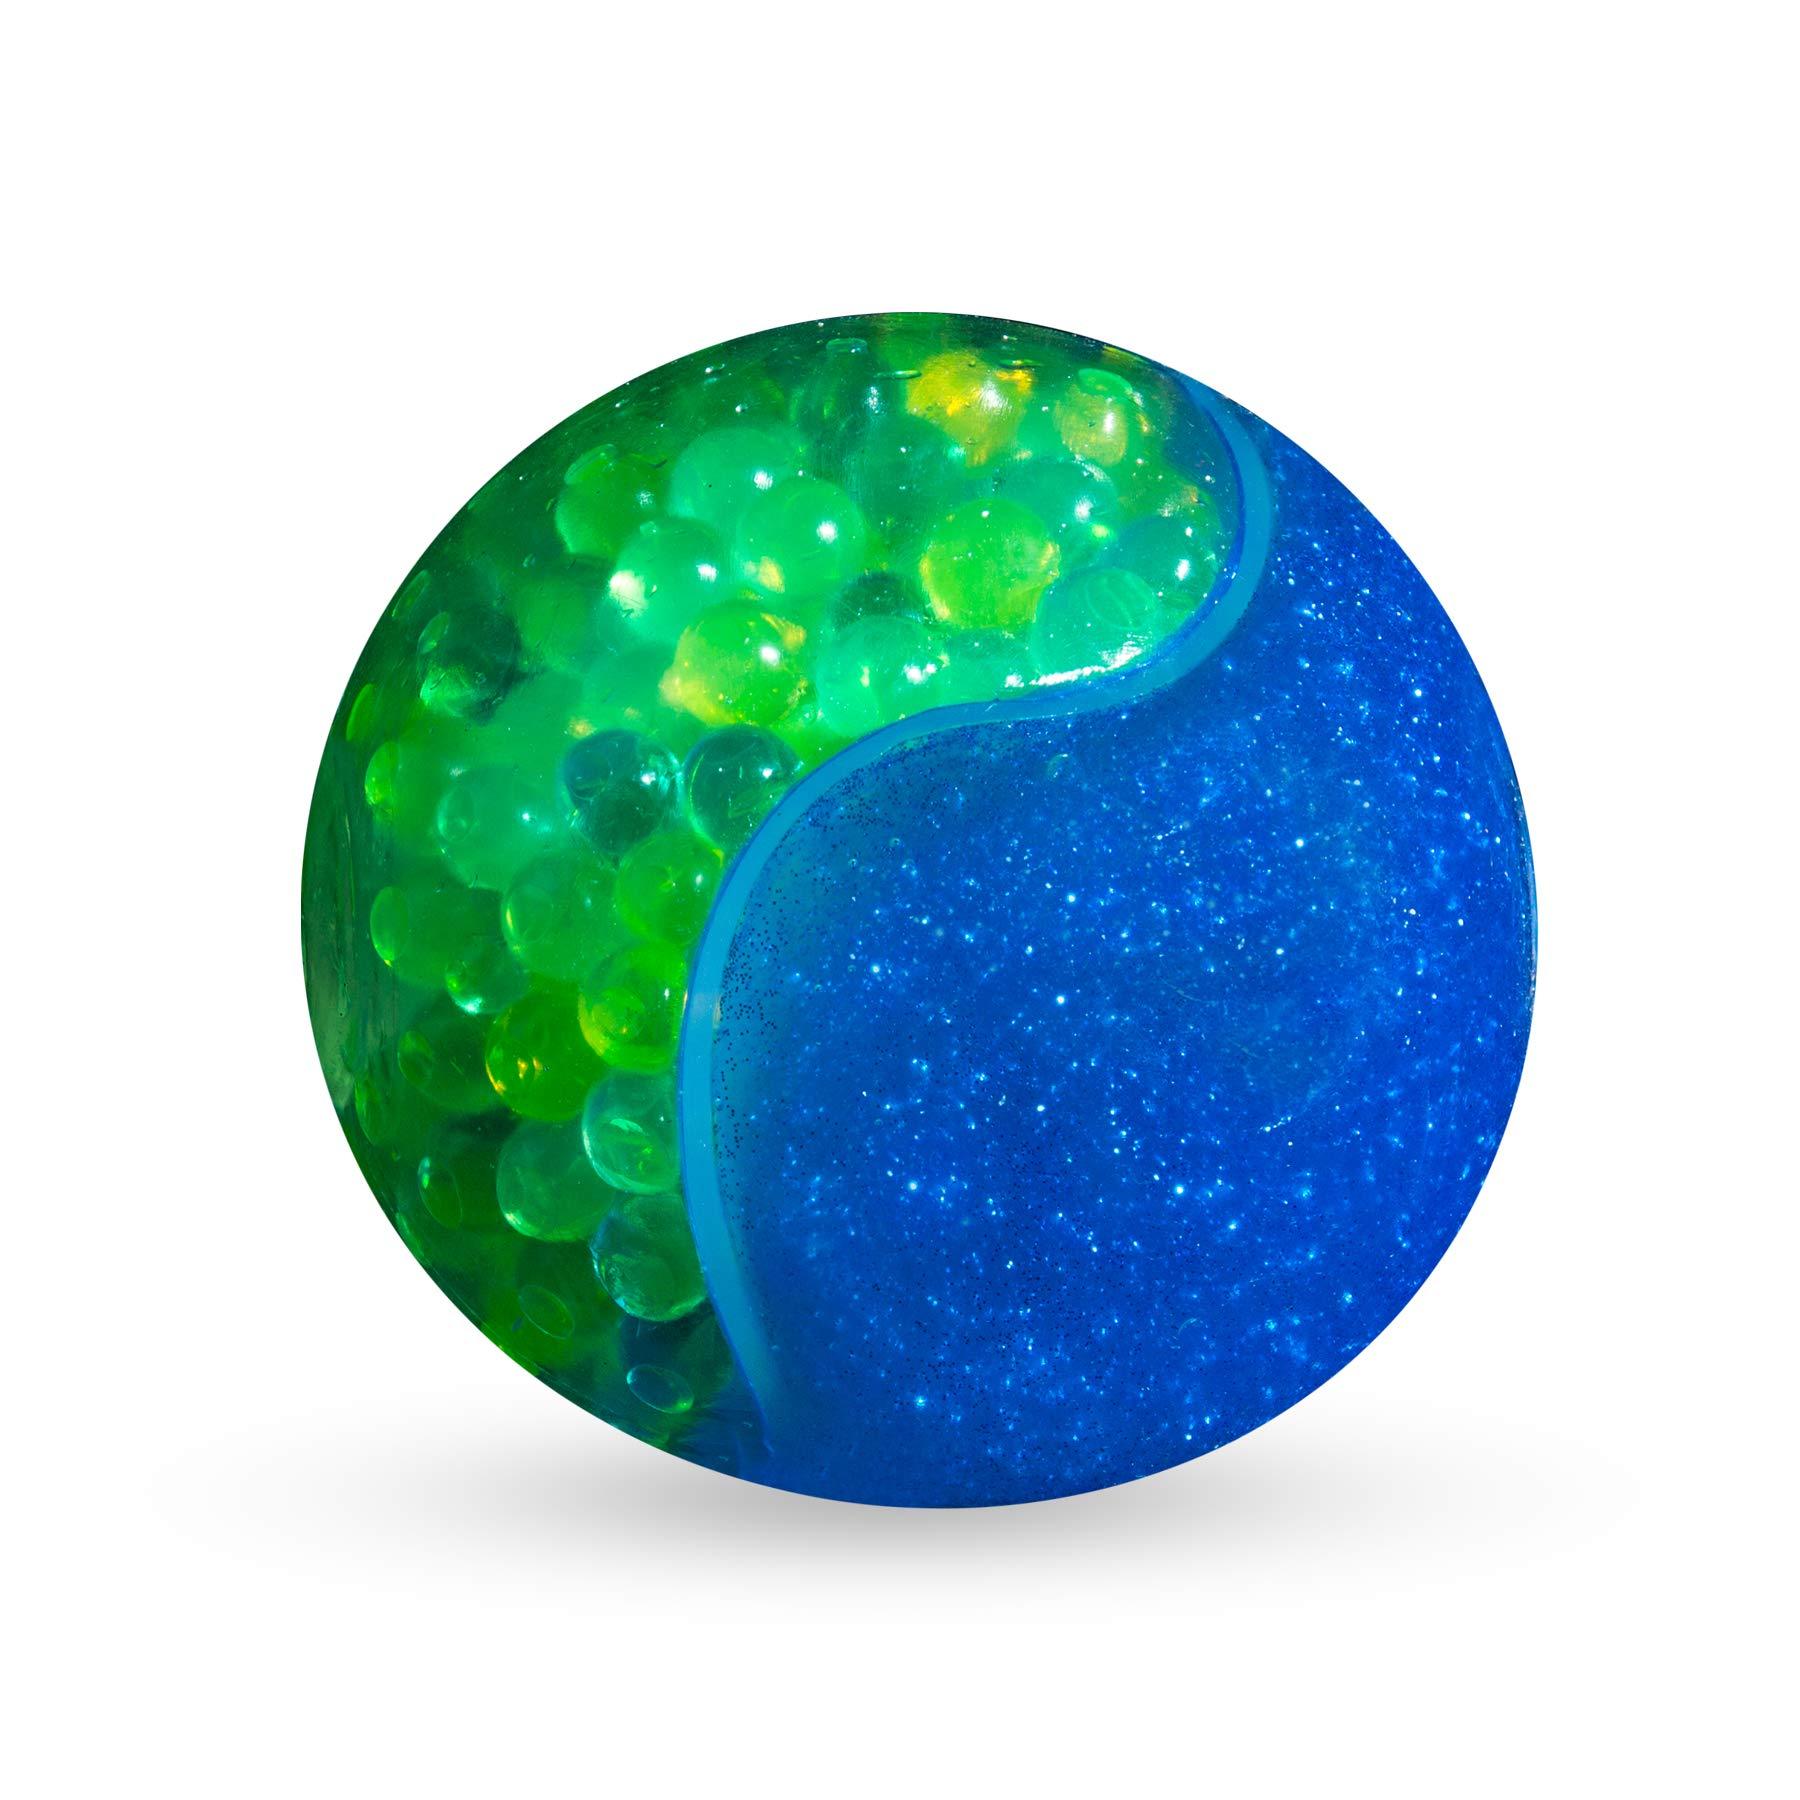 Orb Odditeez Ultra 4 Halfzeez Ball Squishy Slime Ball Half Glitter Slime Half Balzz & HOT New Toy (Blue-Green)